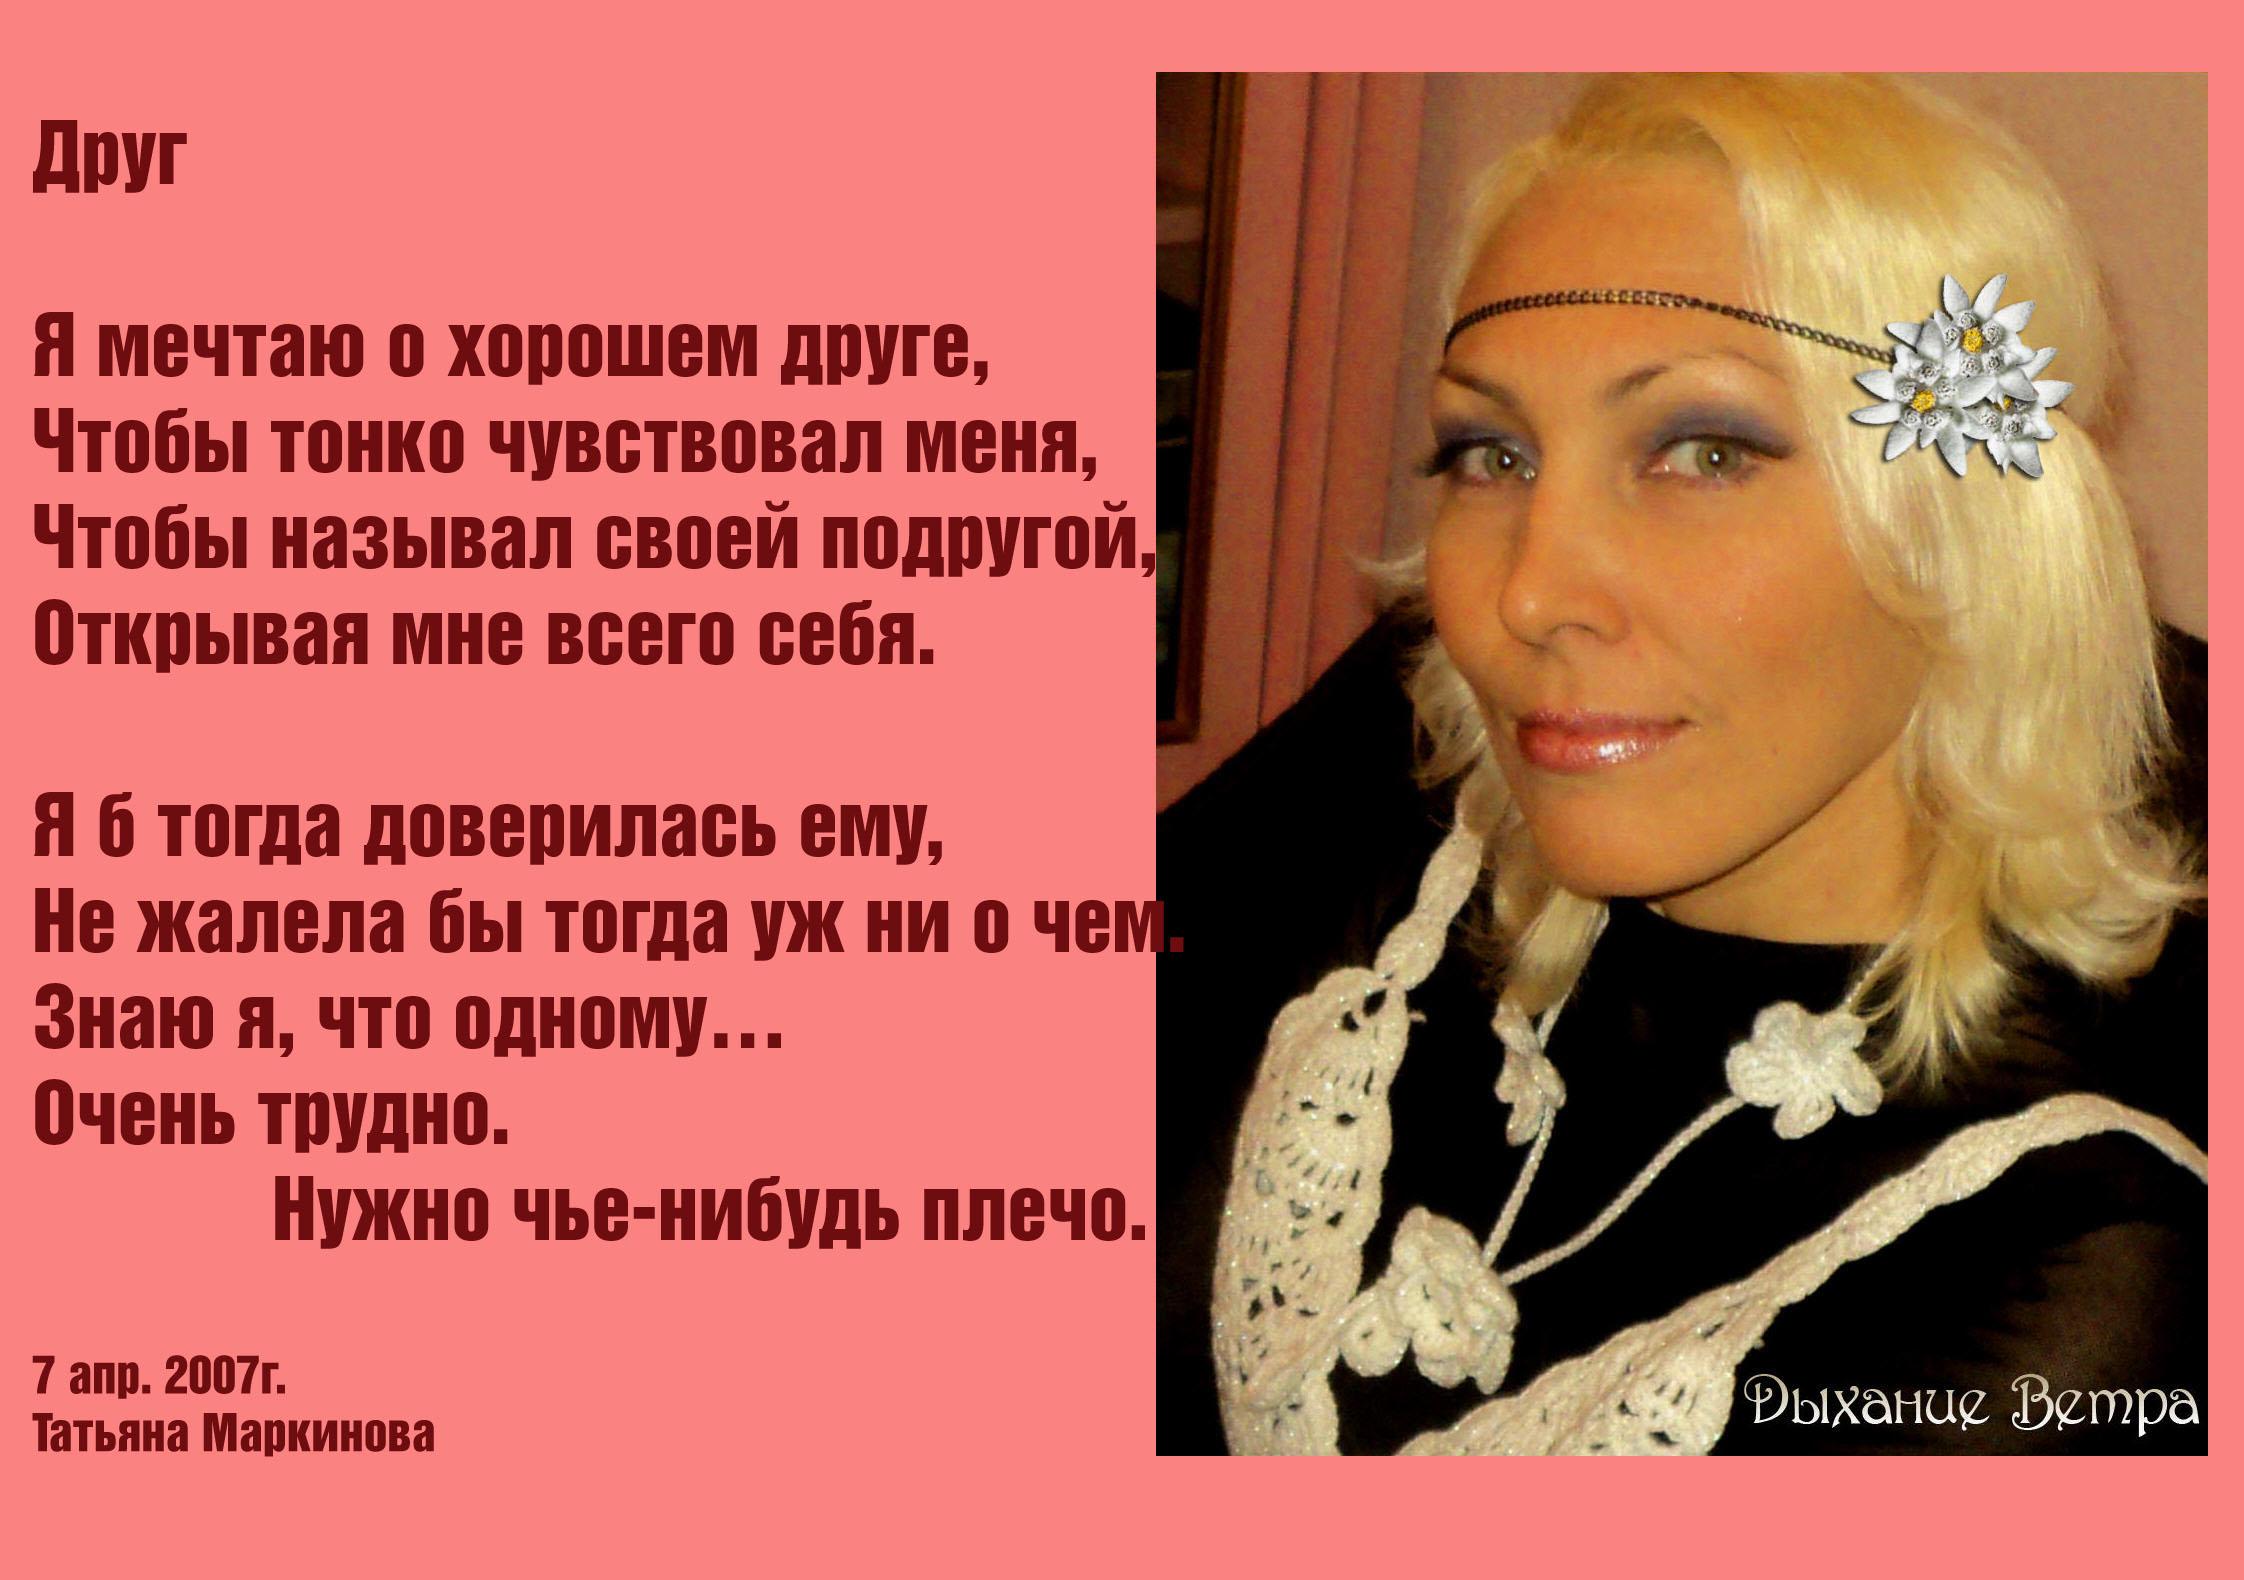 Друг. Татьяна Маркинова